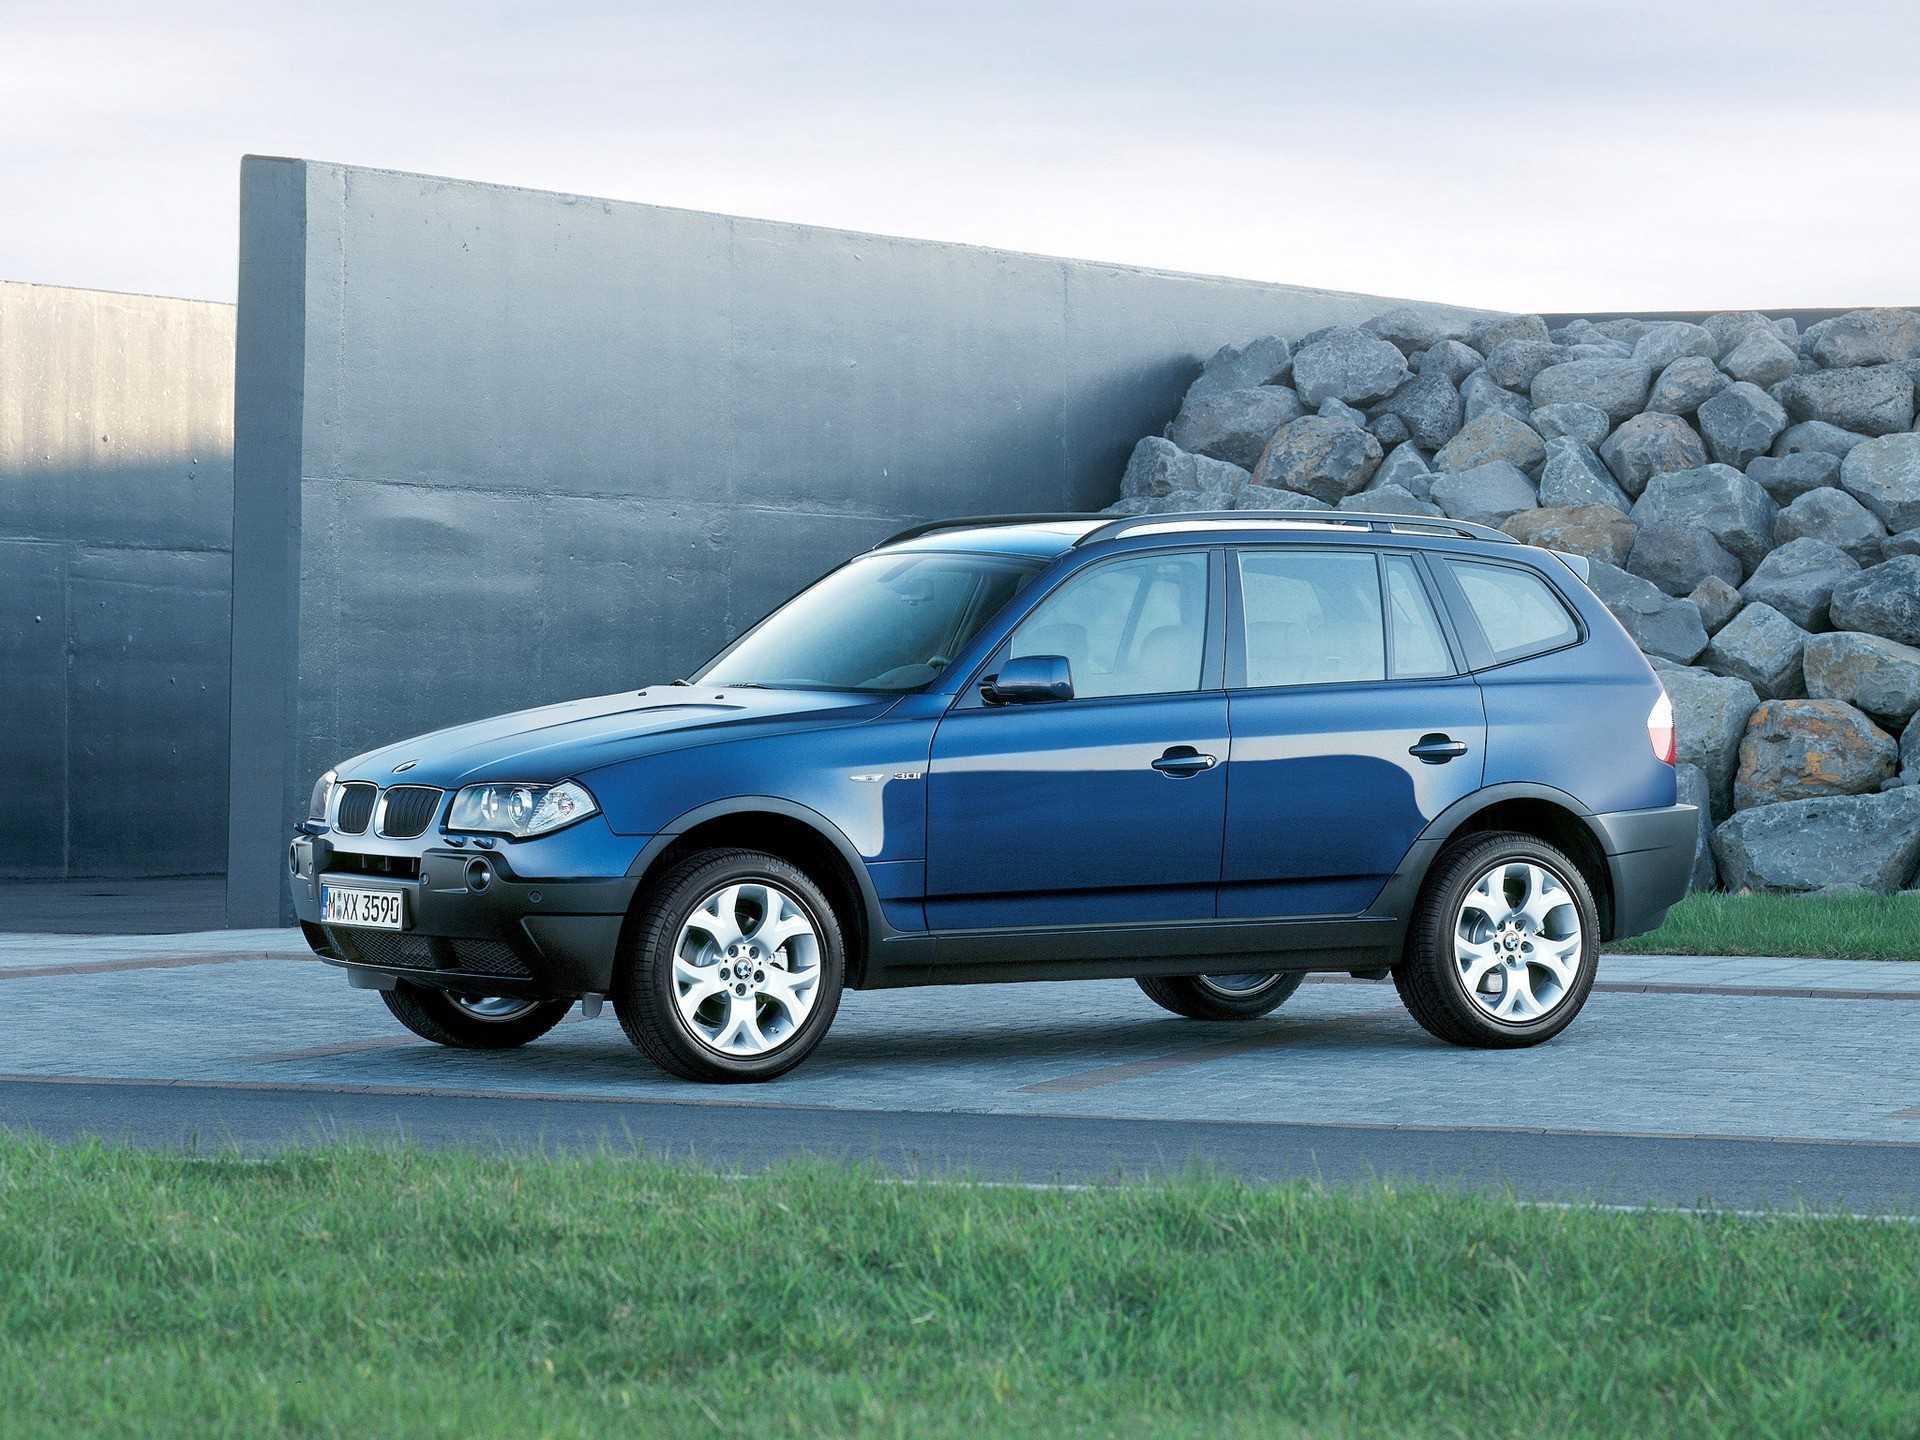 Характеристики BMW M50, достоинства БМВ М50